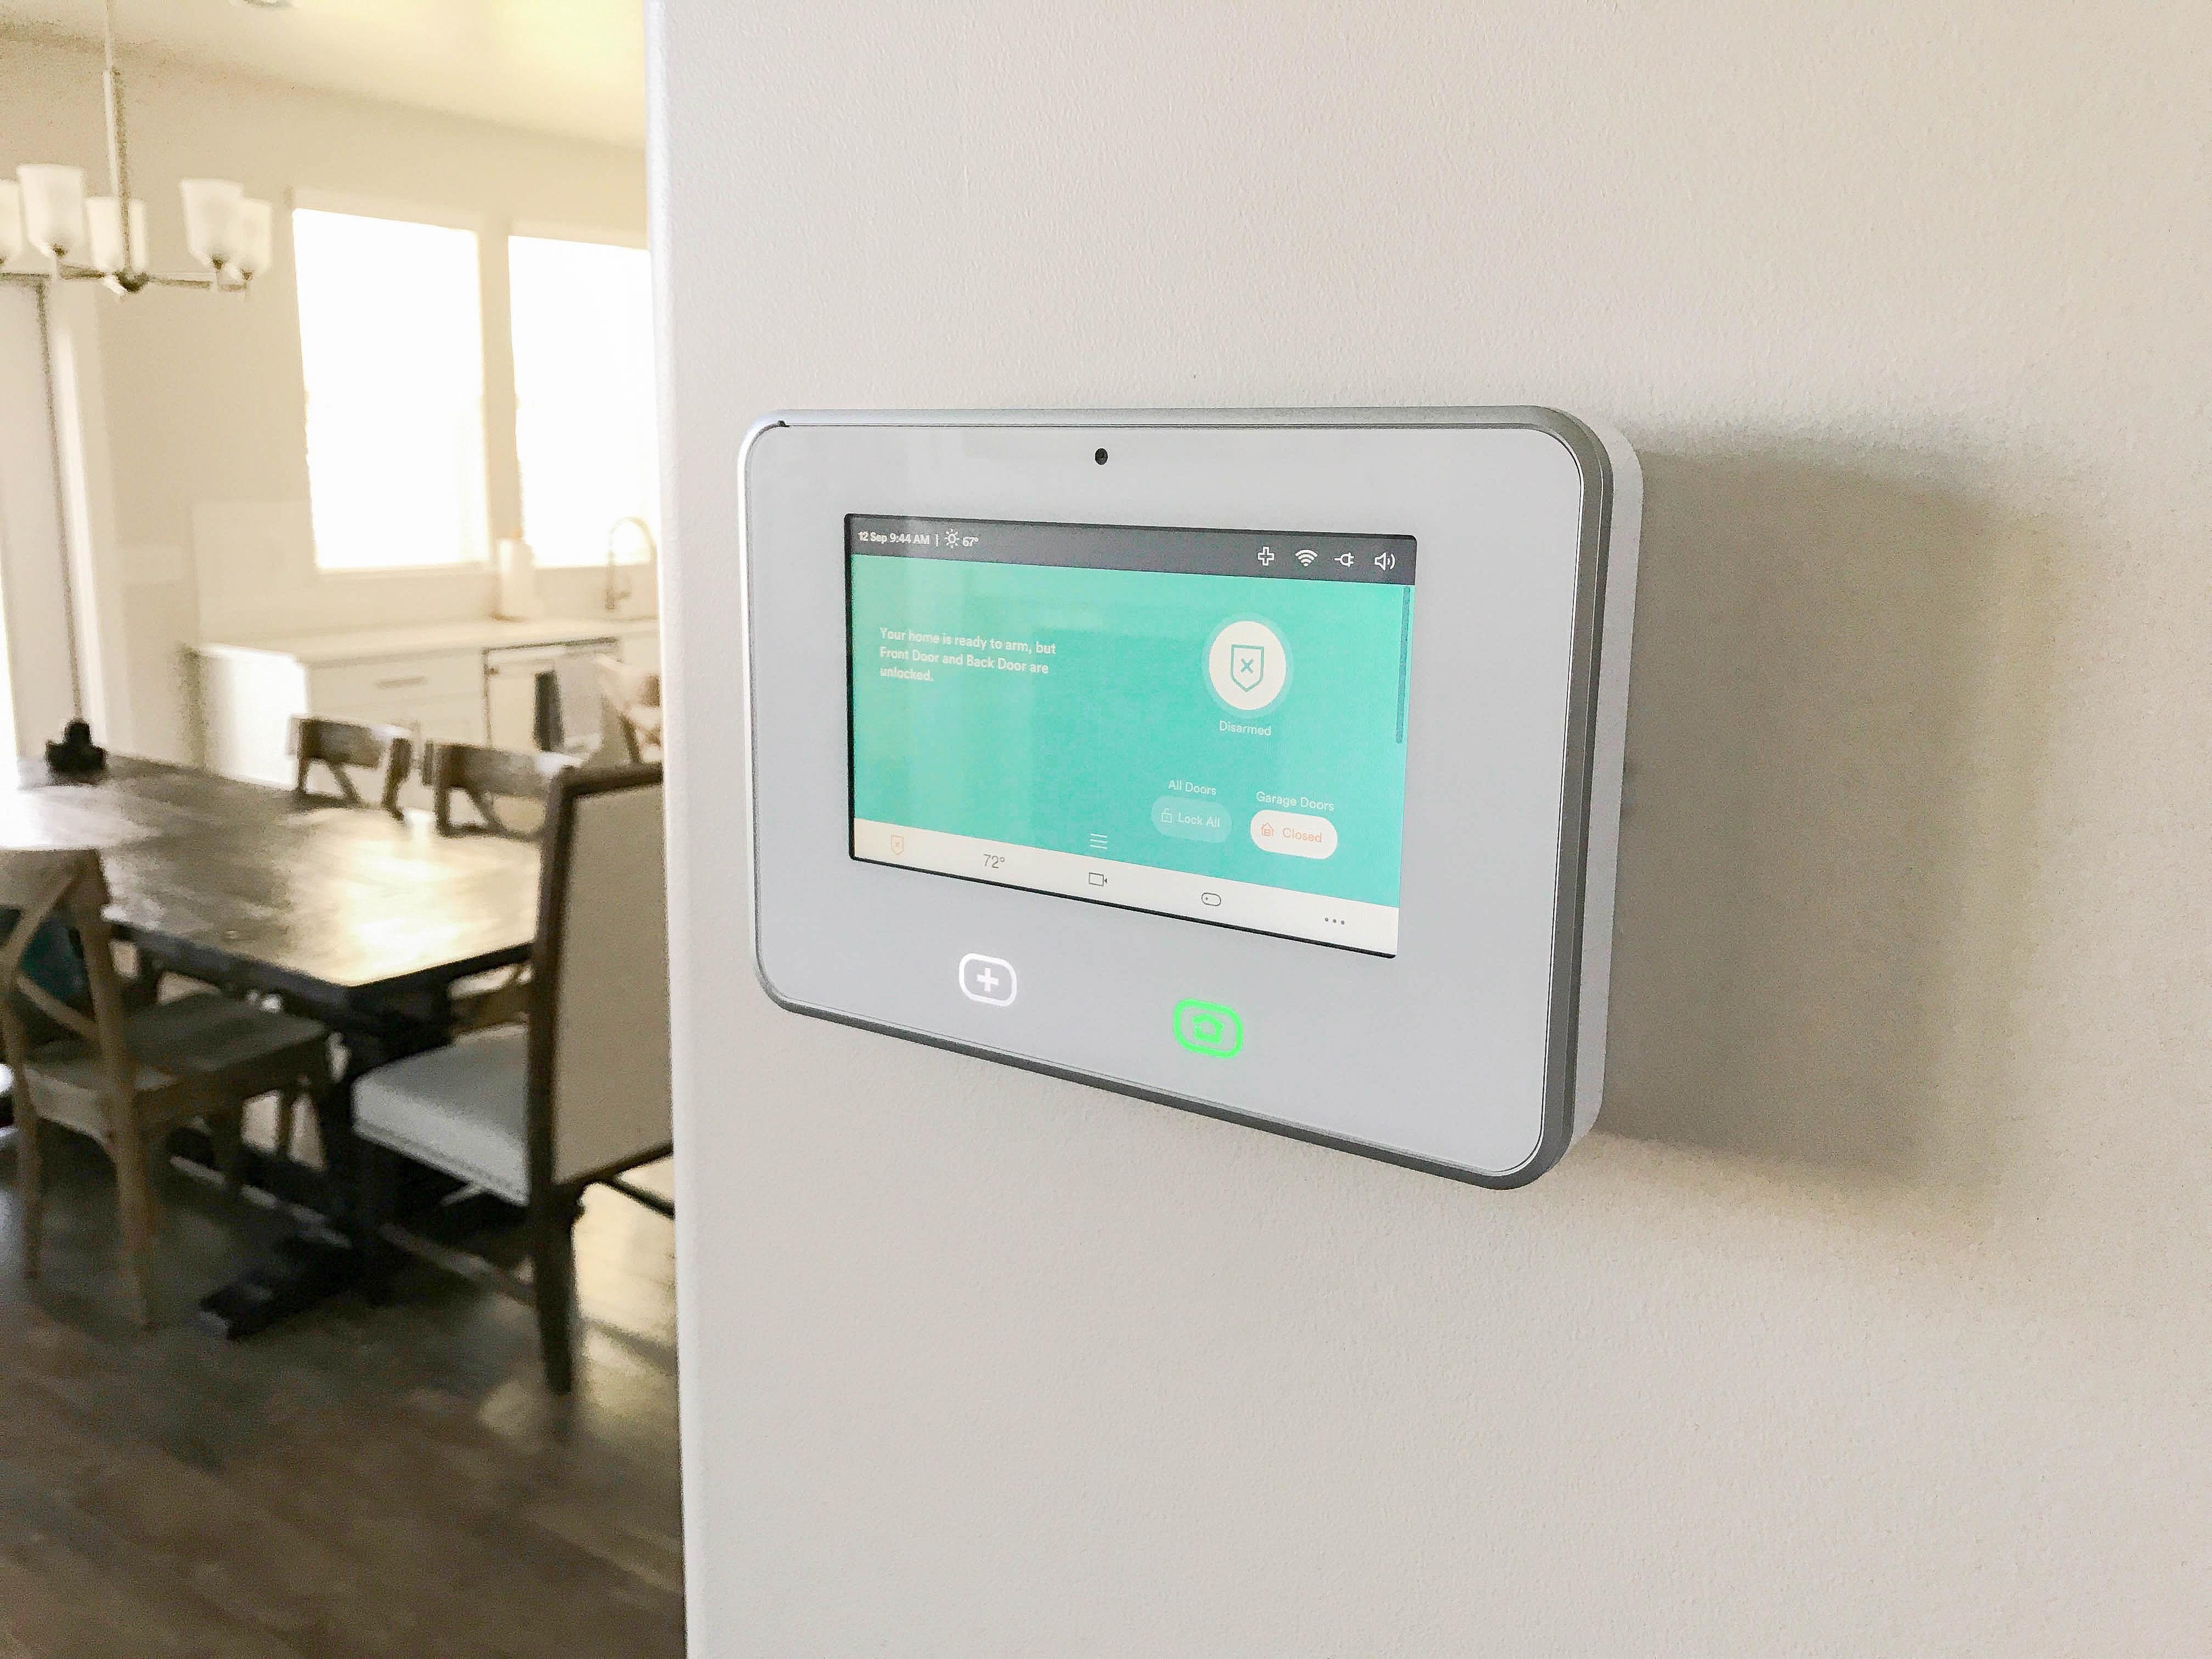 Vivint Smart Home System Review